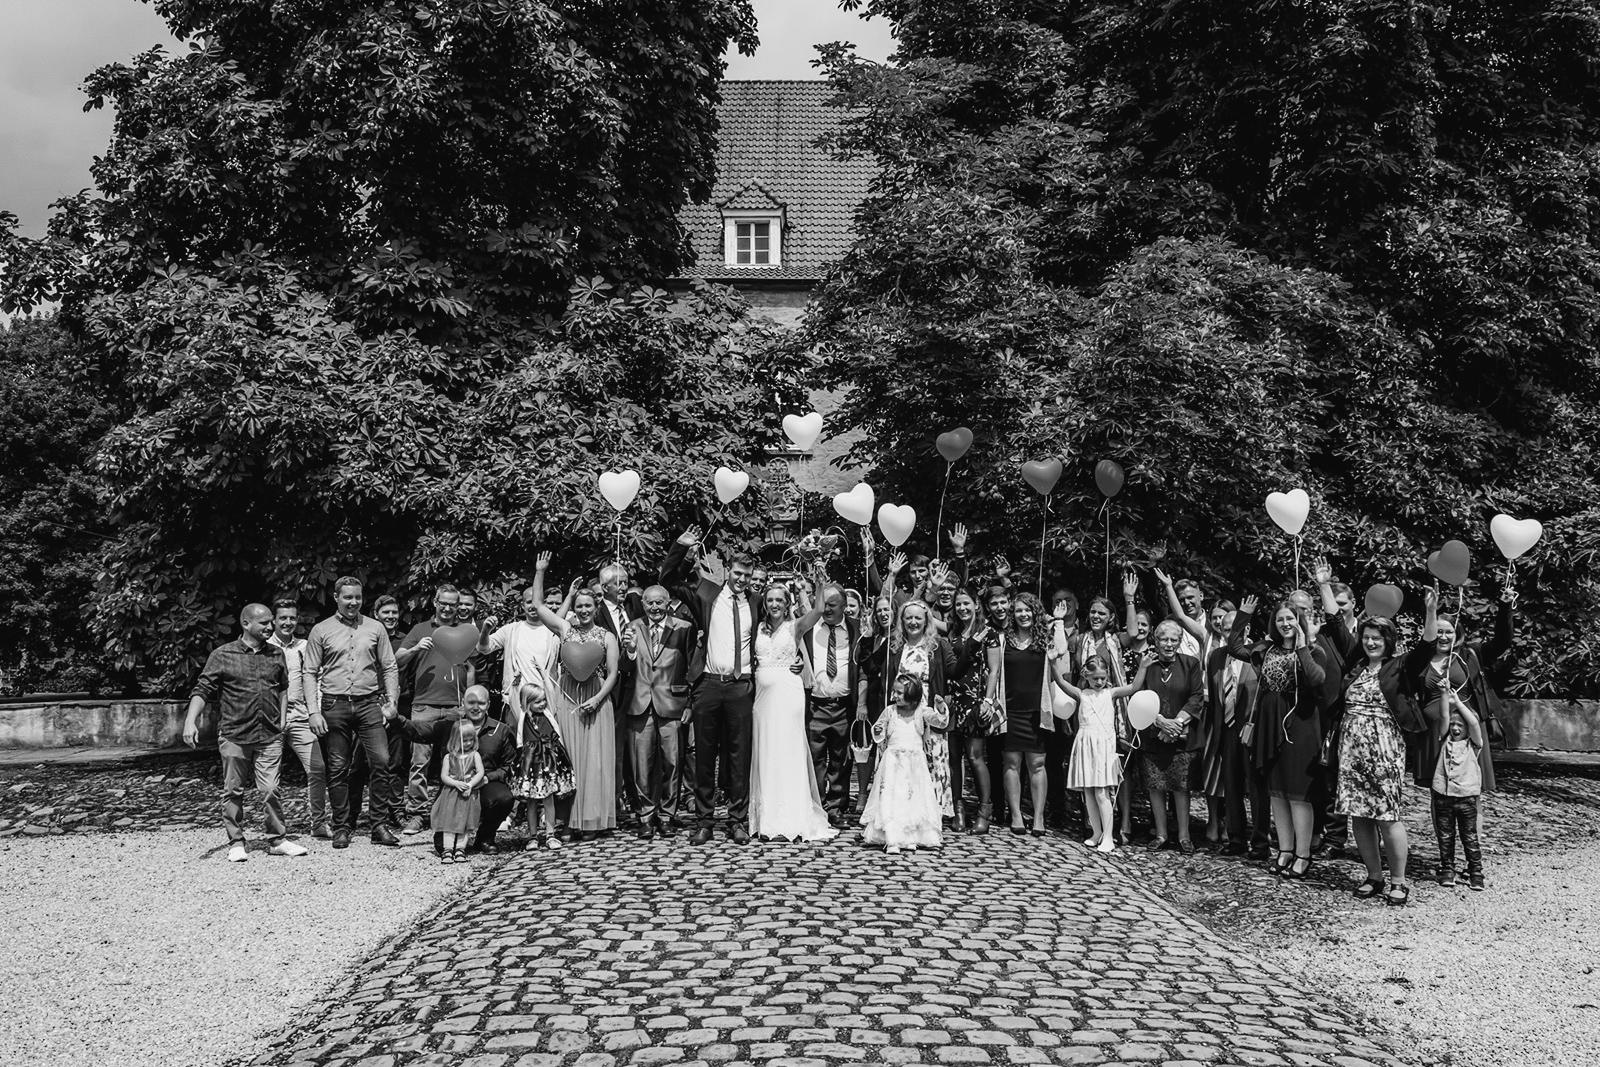 Hochzeitsgesellschaft Gruppenbild